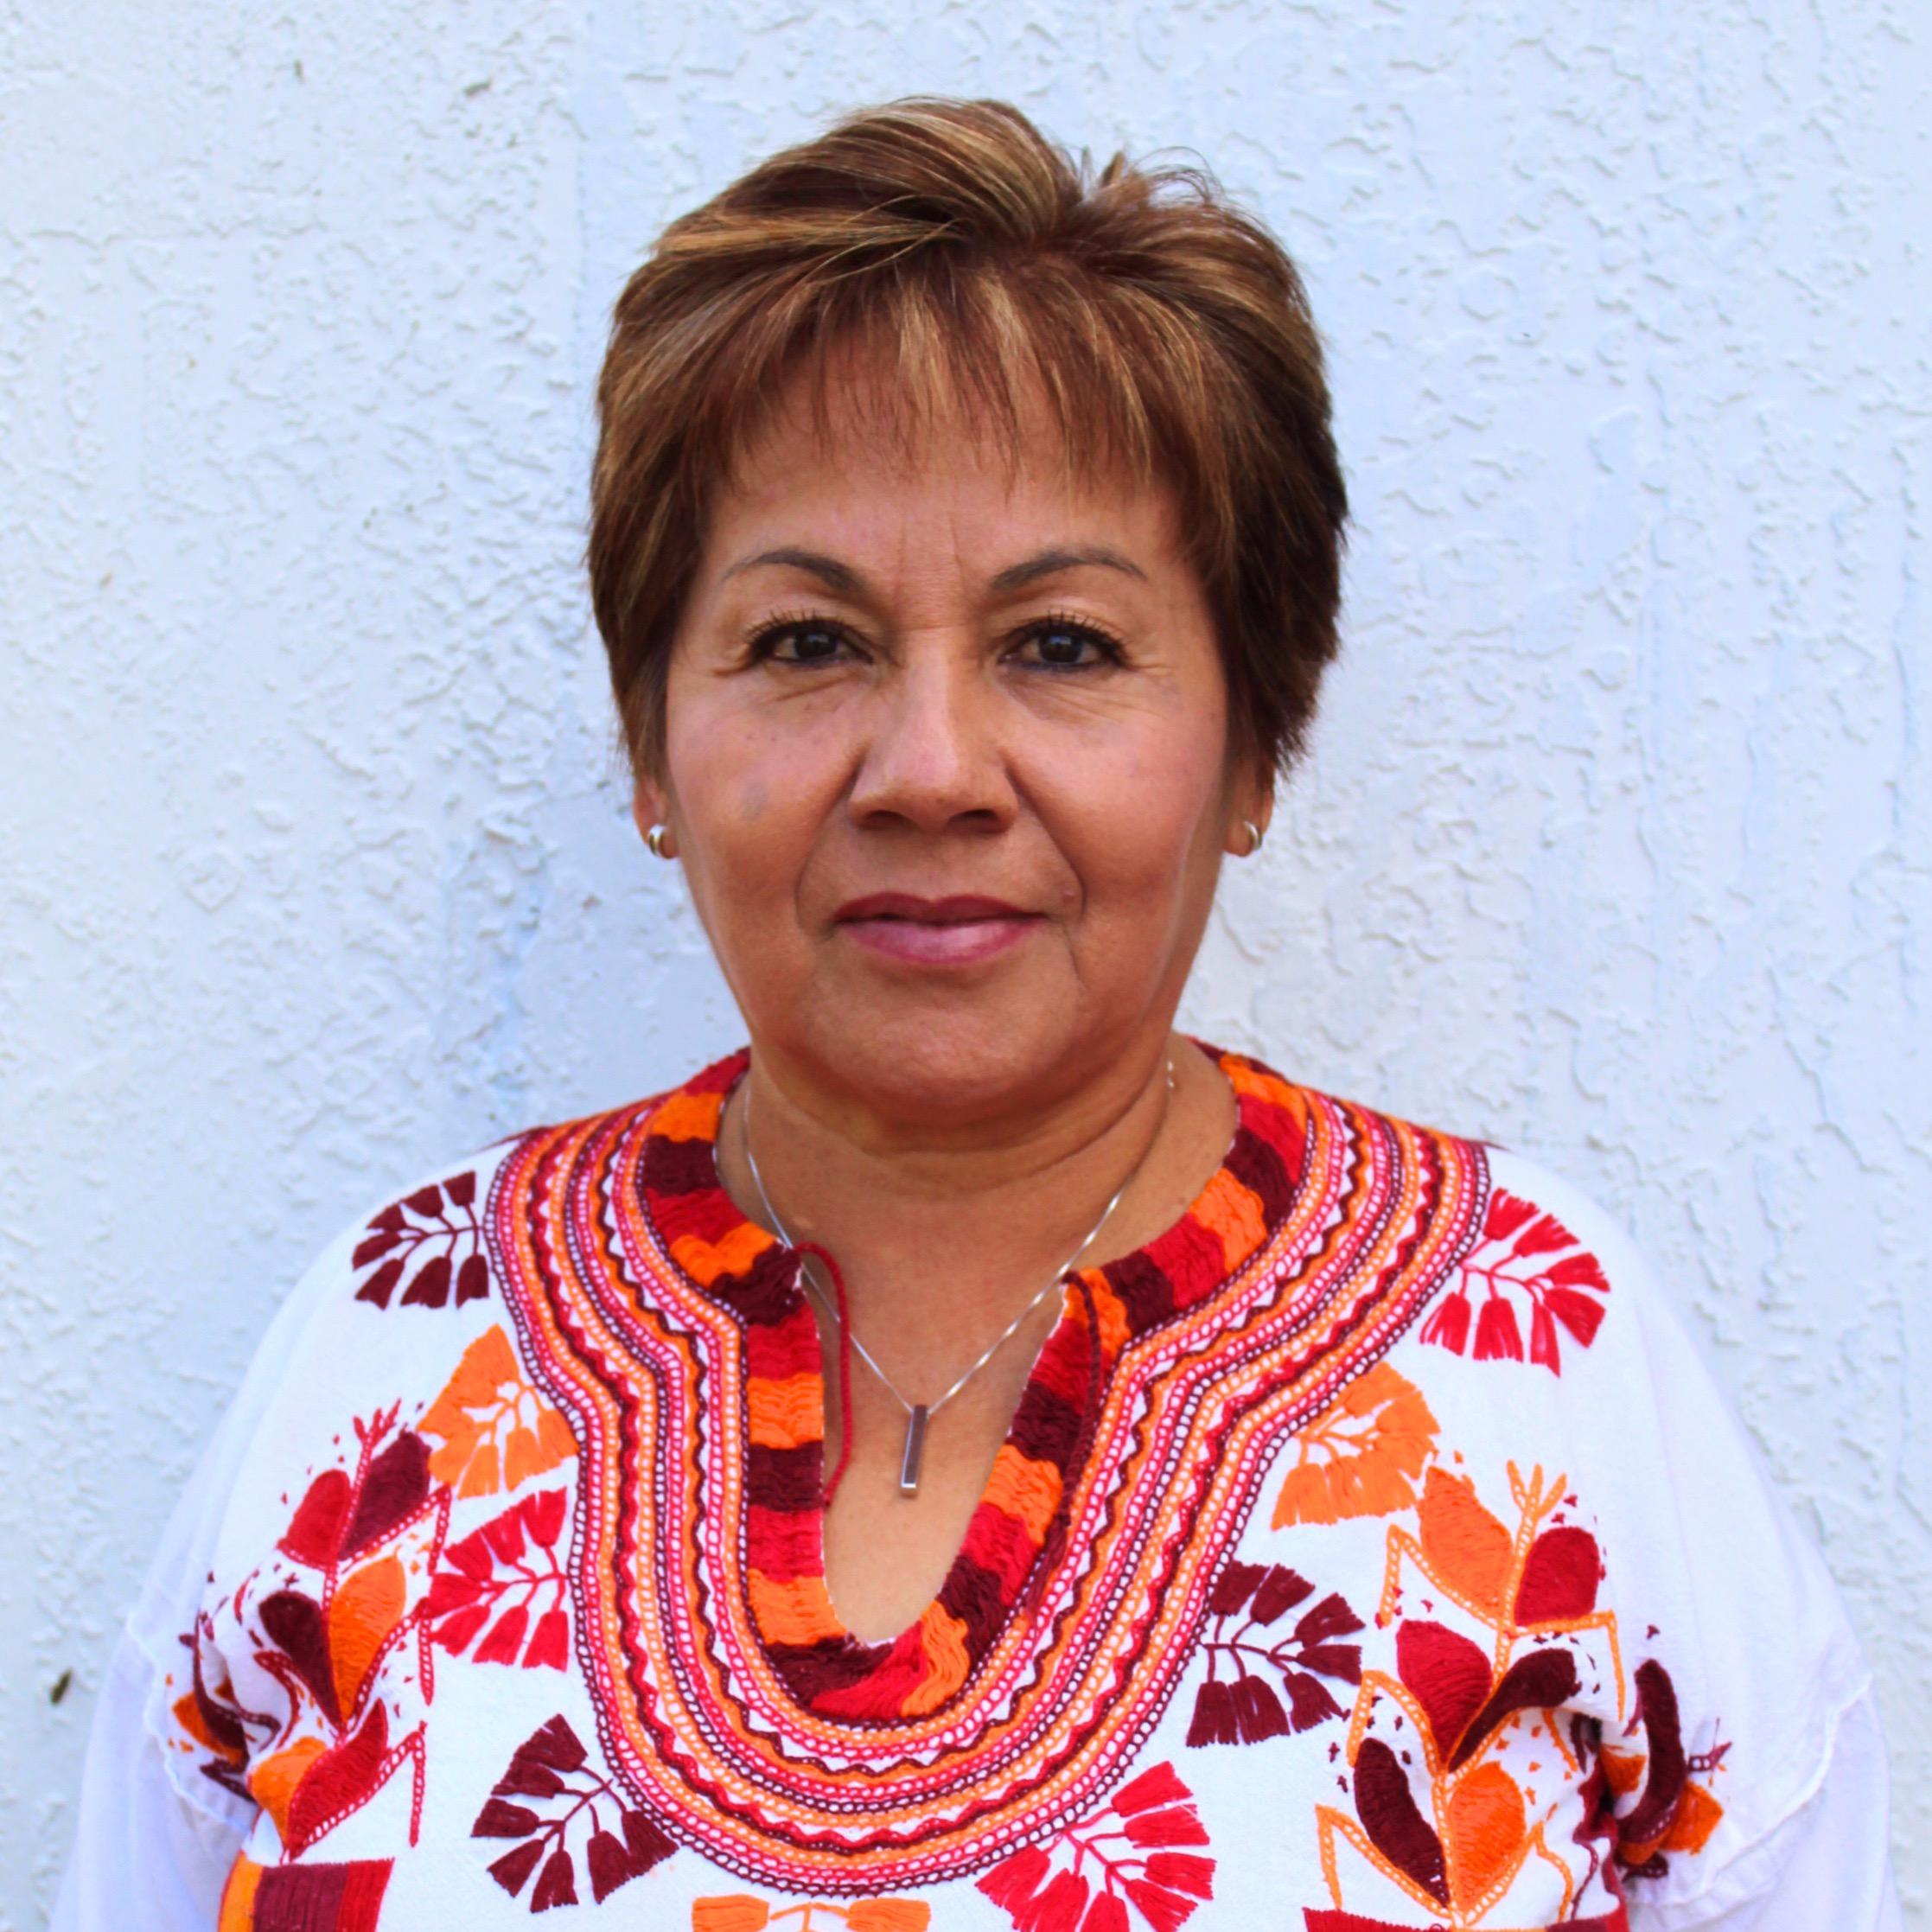 Elvira Carvajal, Lead Community Organizer